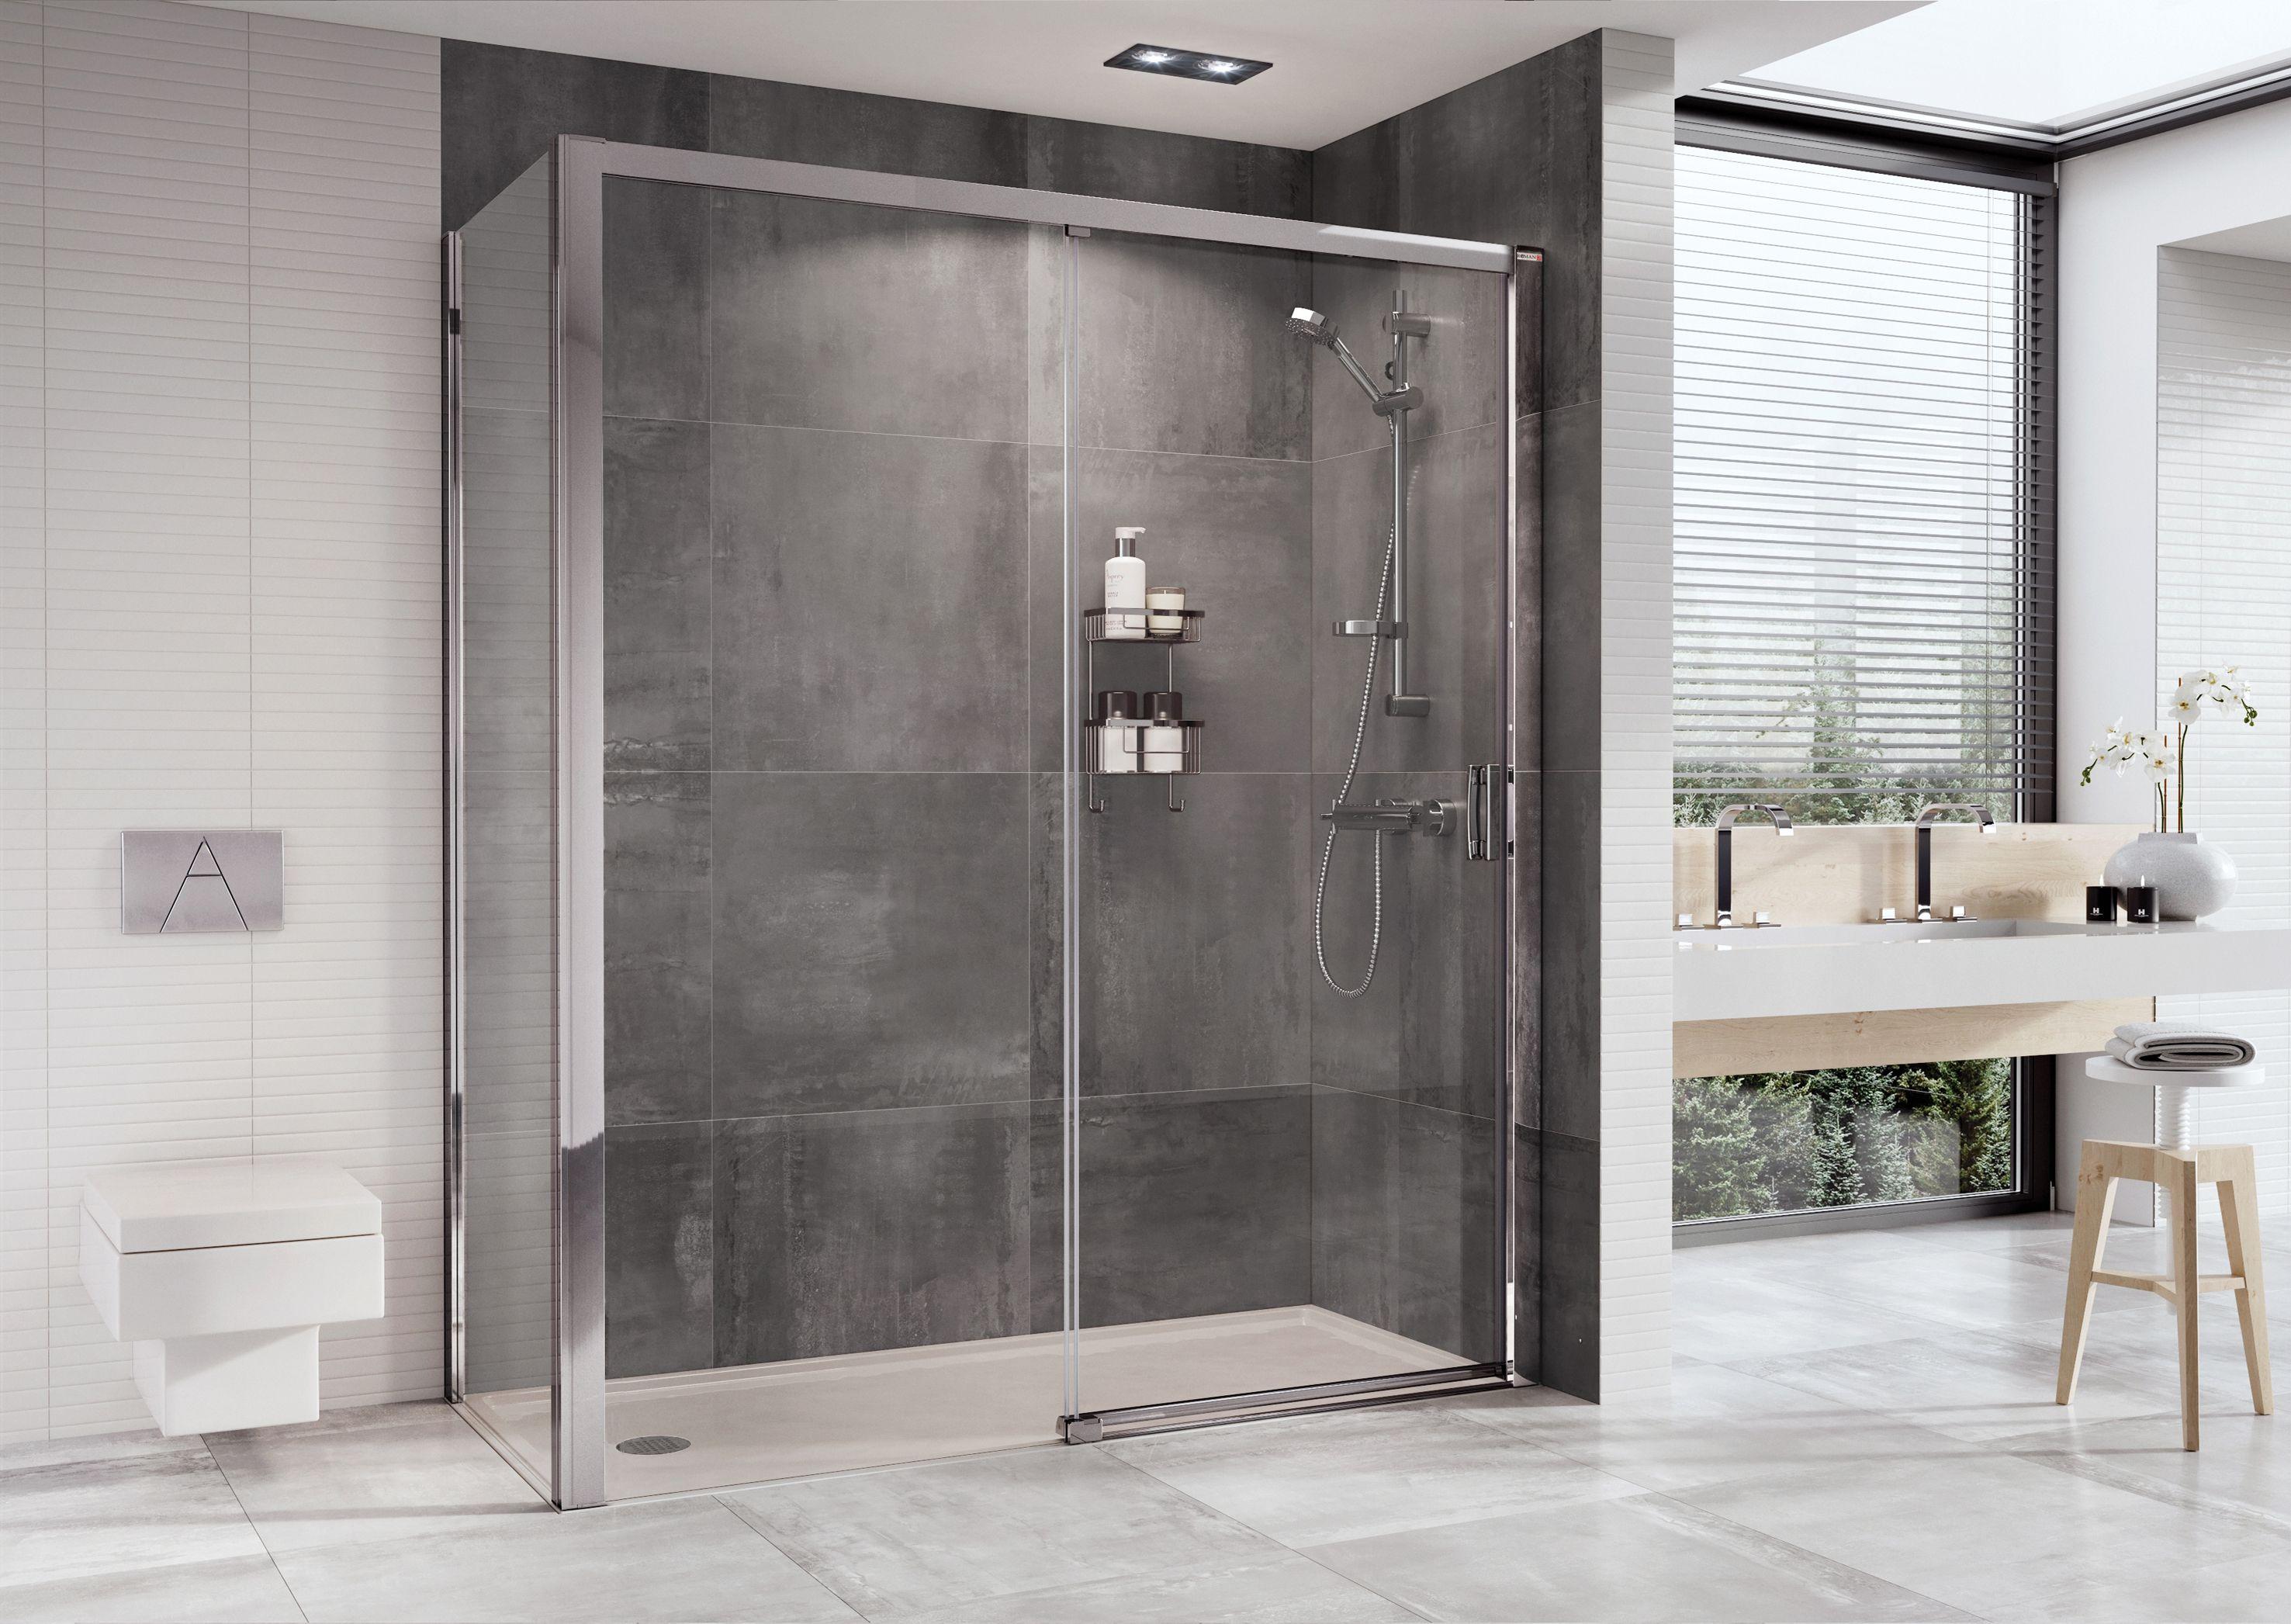 Embrace Level Access Sliding Door Shower Enclosure 8mm thick glass ...